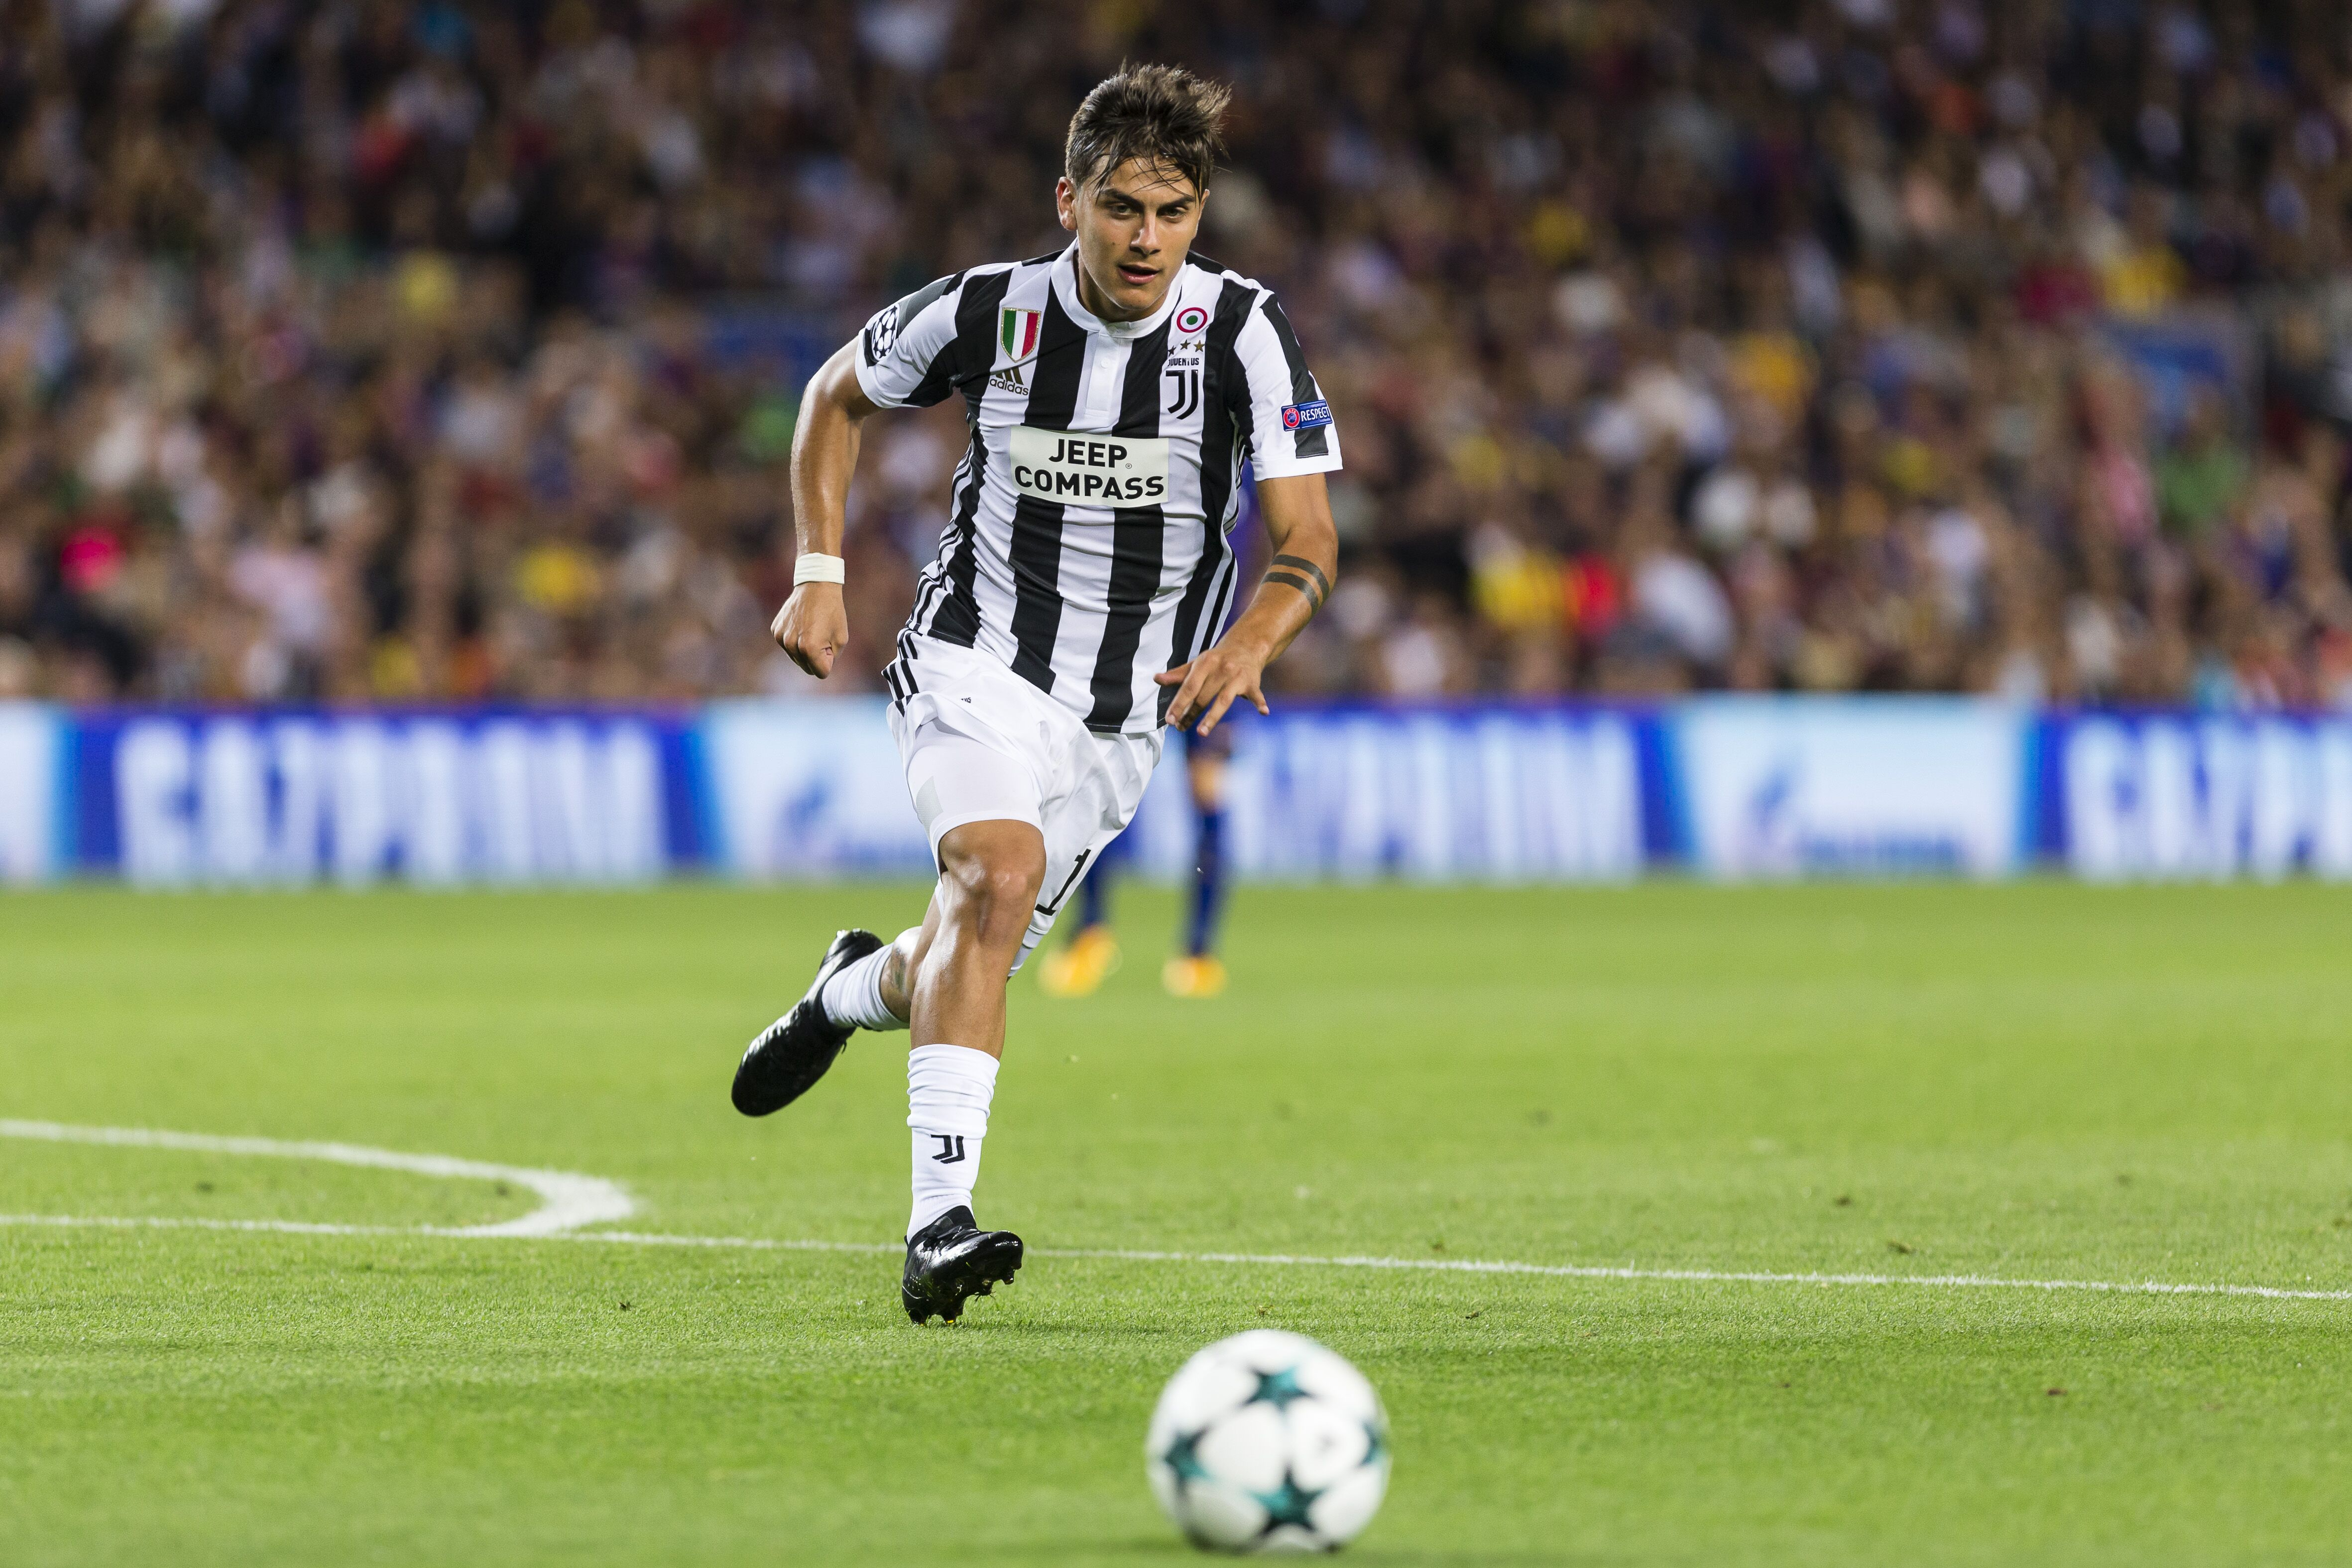 Juventus: Atalanta Vs. Juventus Live Stream: Watch Serie A Online